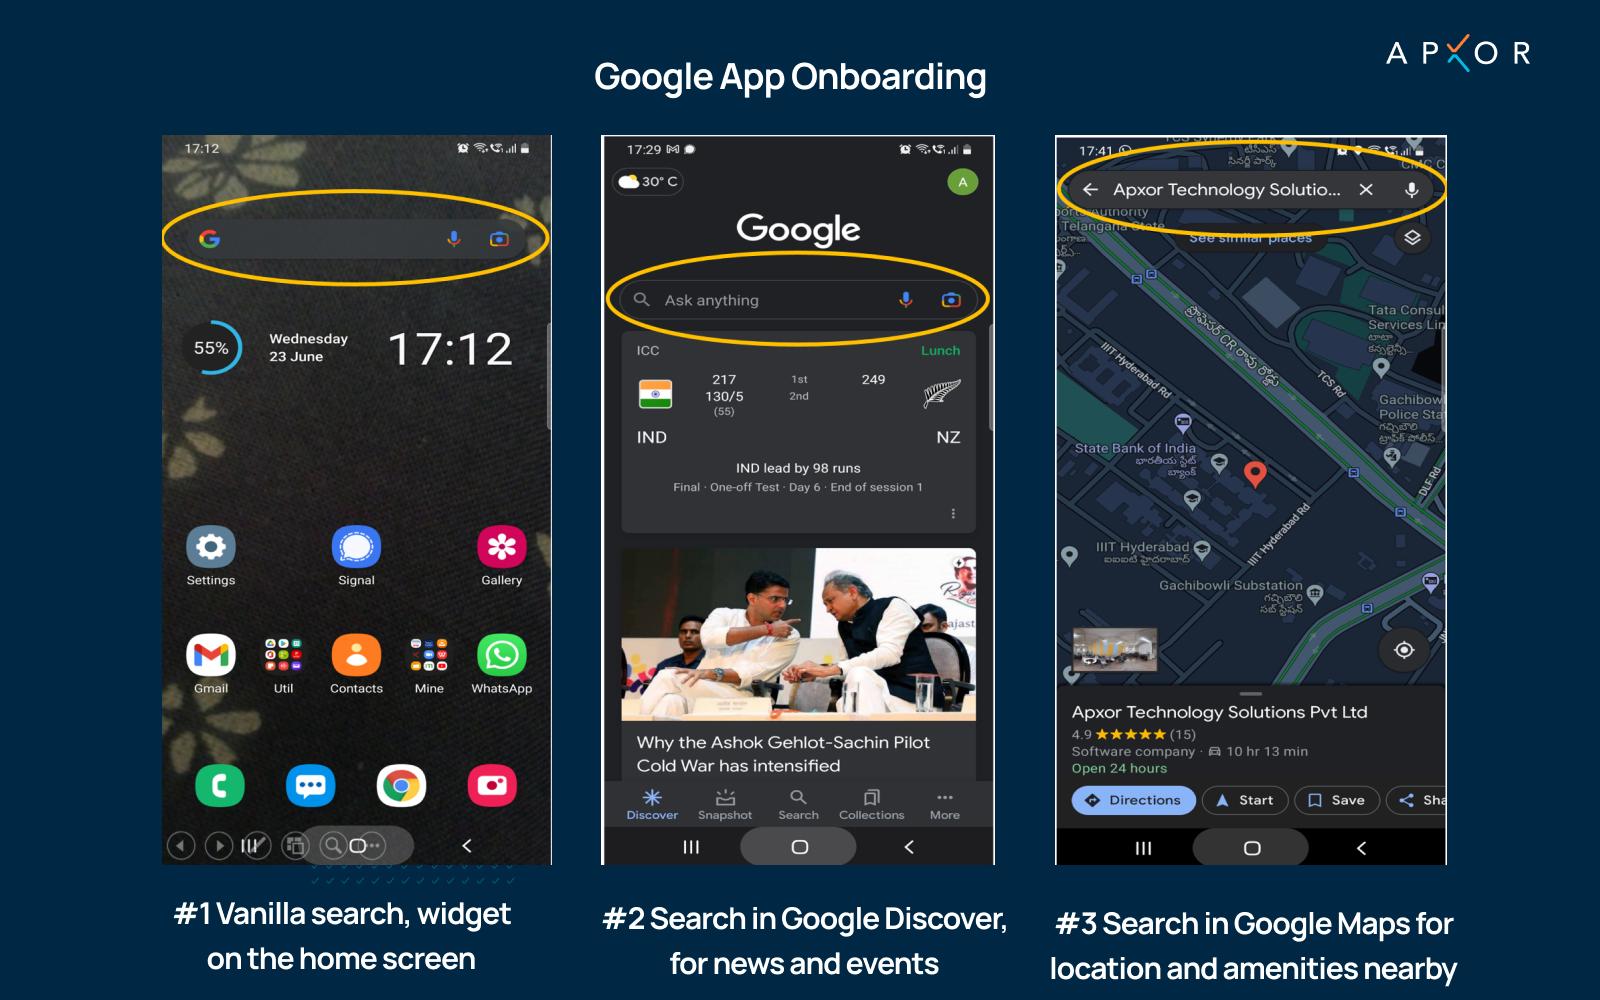 Google app onboarding flow image by Apxor